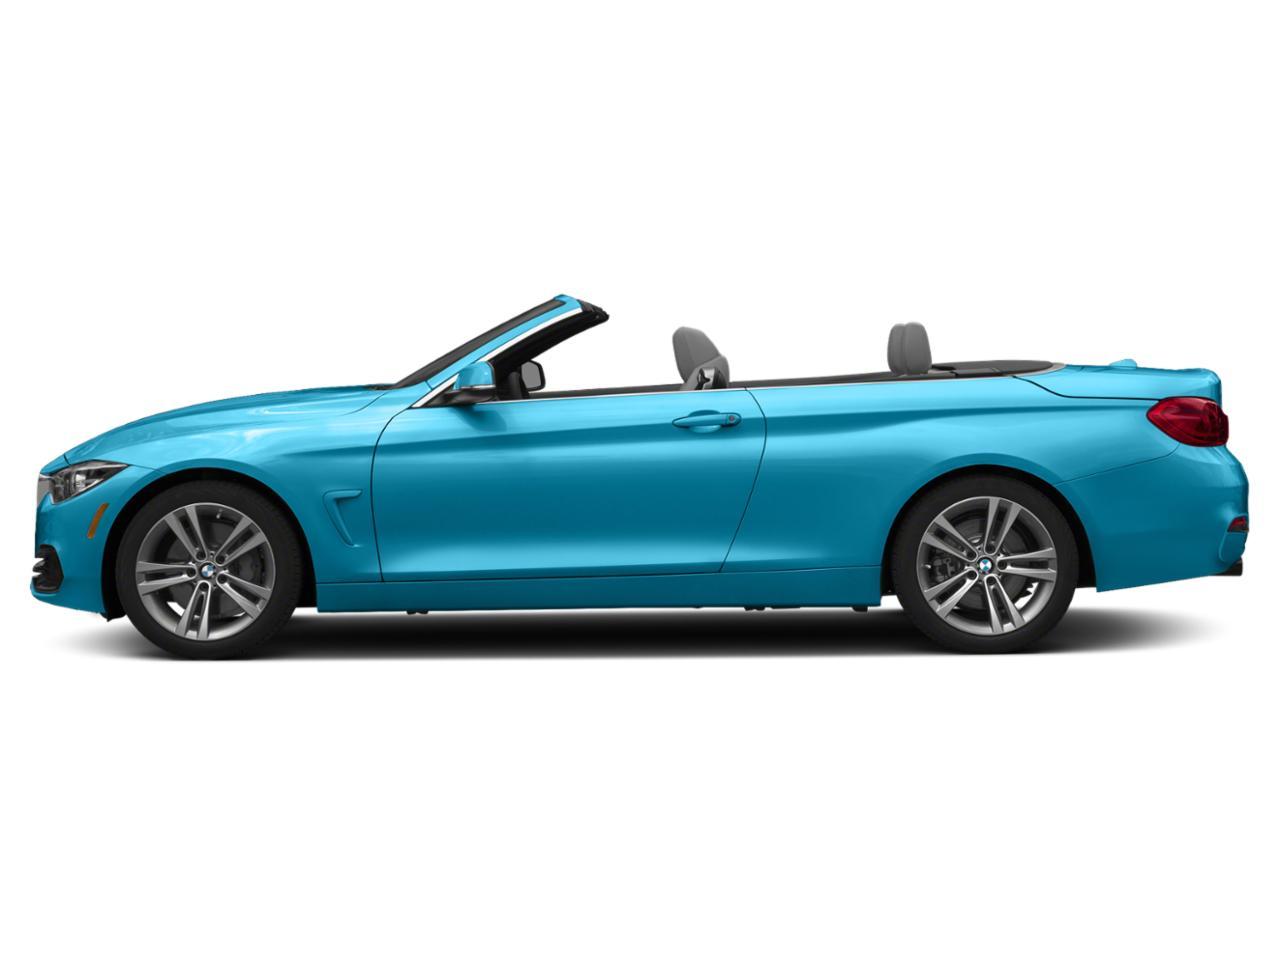 New 2020 Bmw 440i Snapper Rocks Blue Metallic Car For Sale Wba4z5c05l5s07018